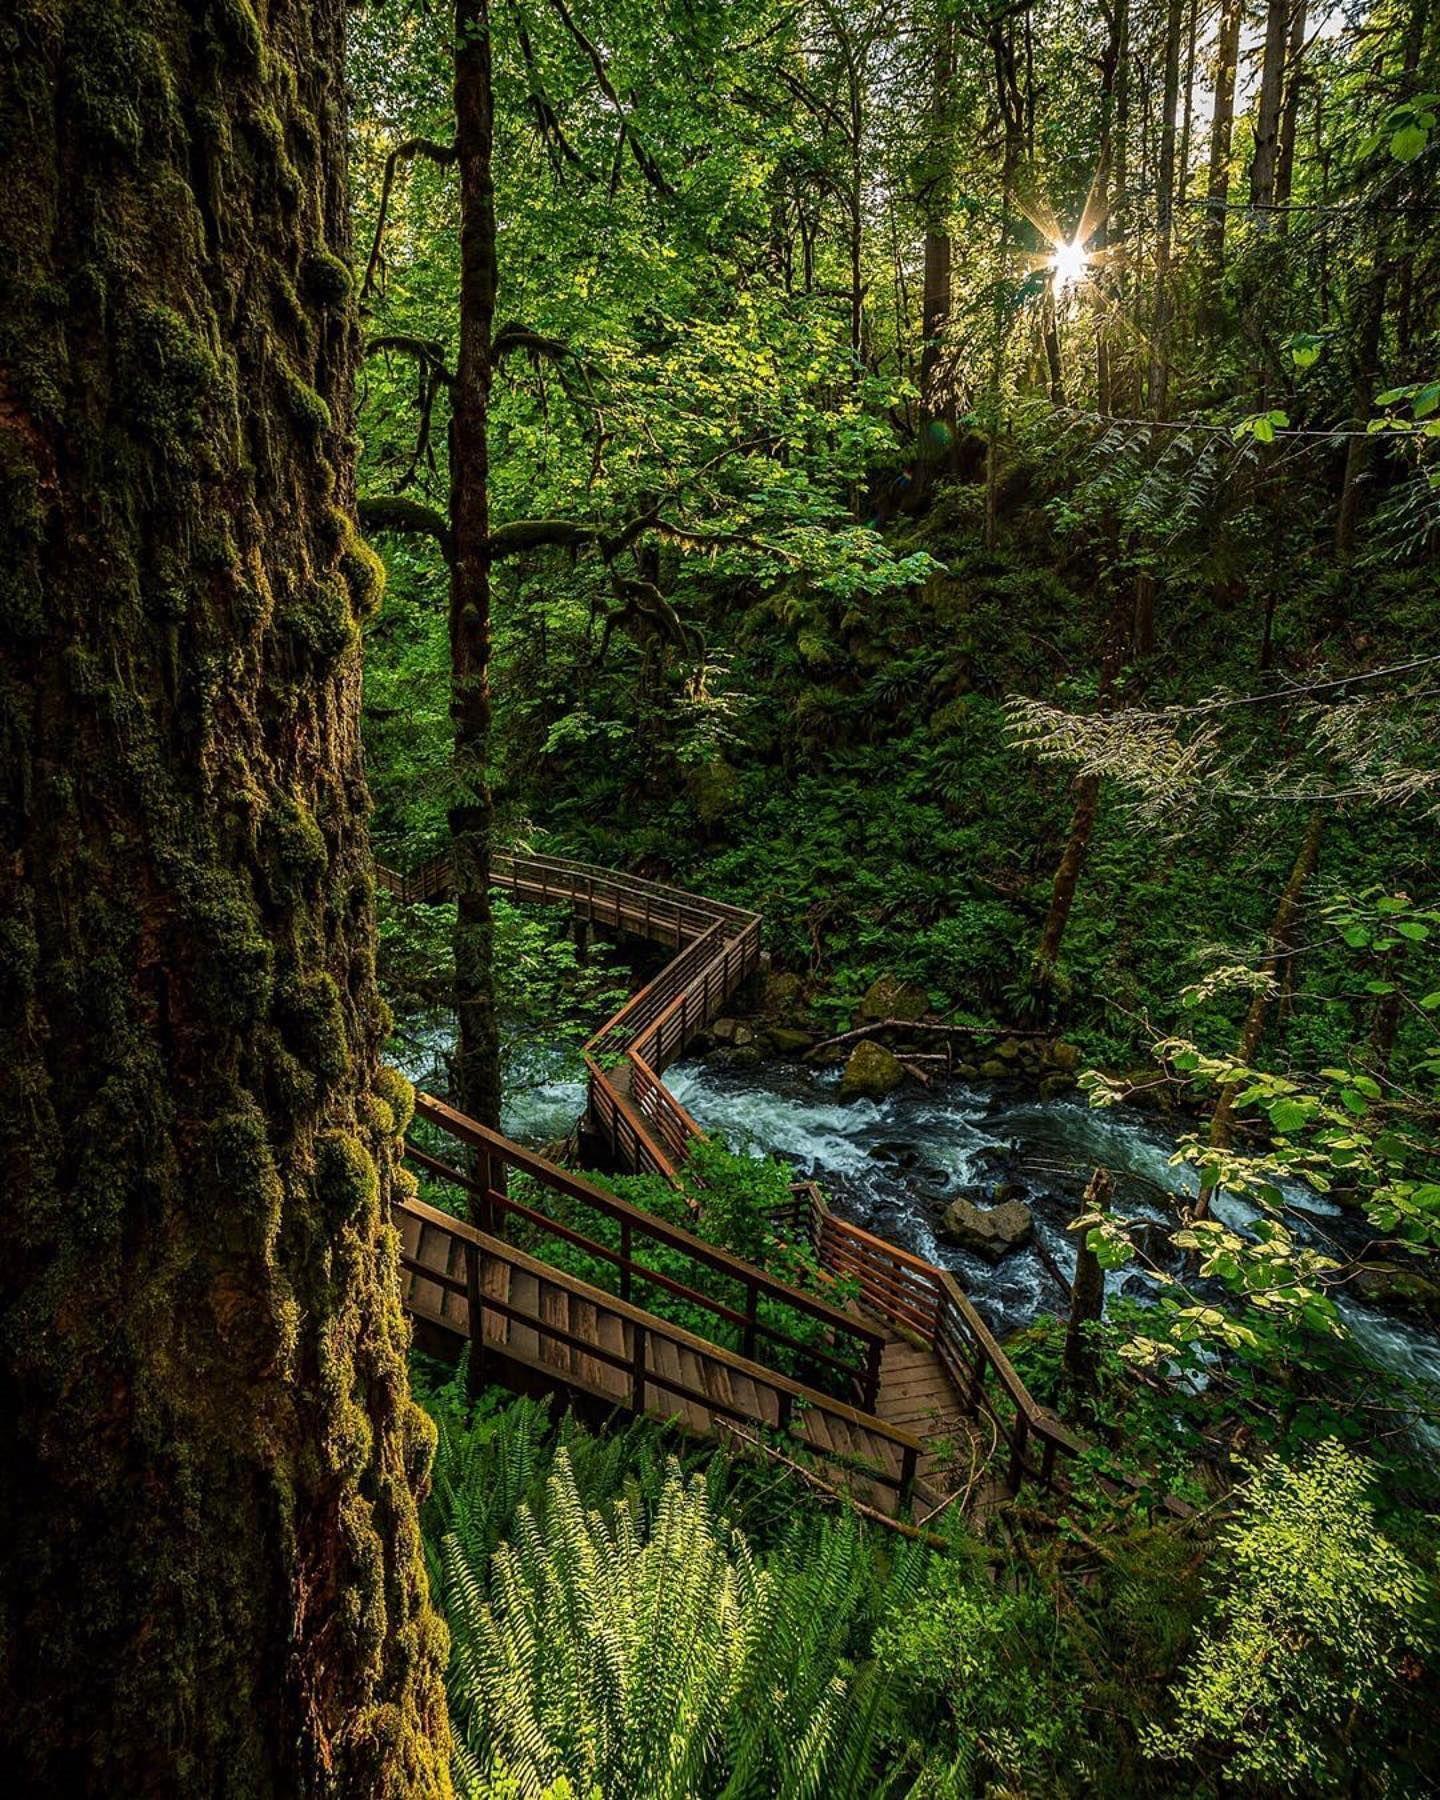 Repost  @pnw.adventures.82  Into the forrest i go to lose my mind and find my soul! ----- John Muir . . . . . . . . #johnmuir #pnwphotographer #explore #hiking #pnwadventures #wanderlust #exploreoregon #pacificnorthwest #mcdowellcreek #oregonlife #oregonexplored #nikon #d750 #nikonusa #nikonphotography #igaddict #ig_moods #oregonforrest #mothernature